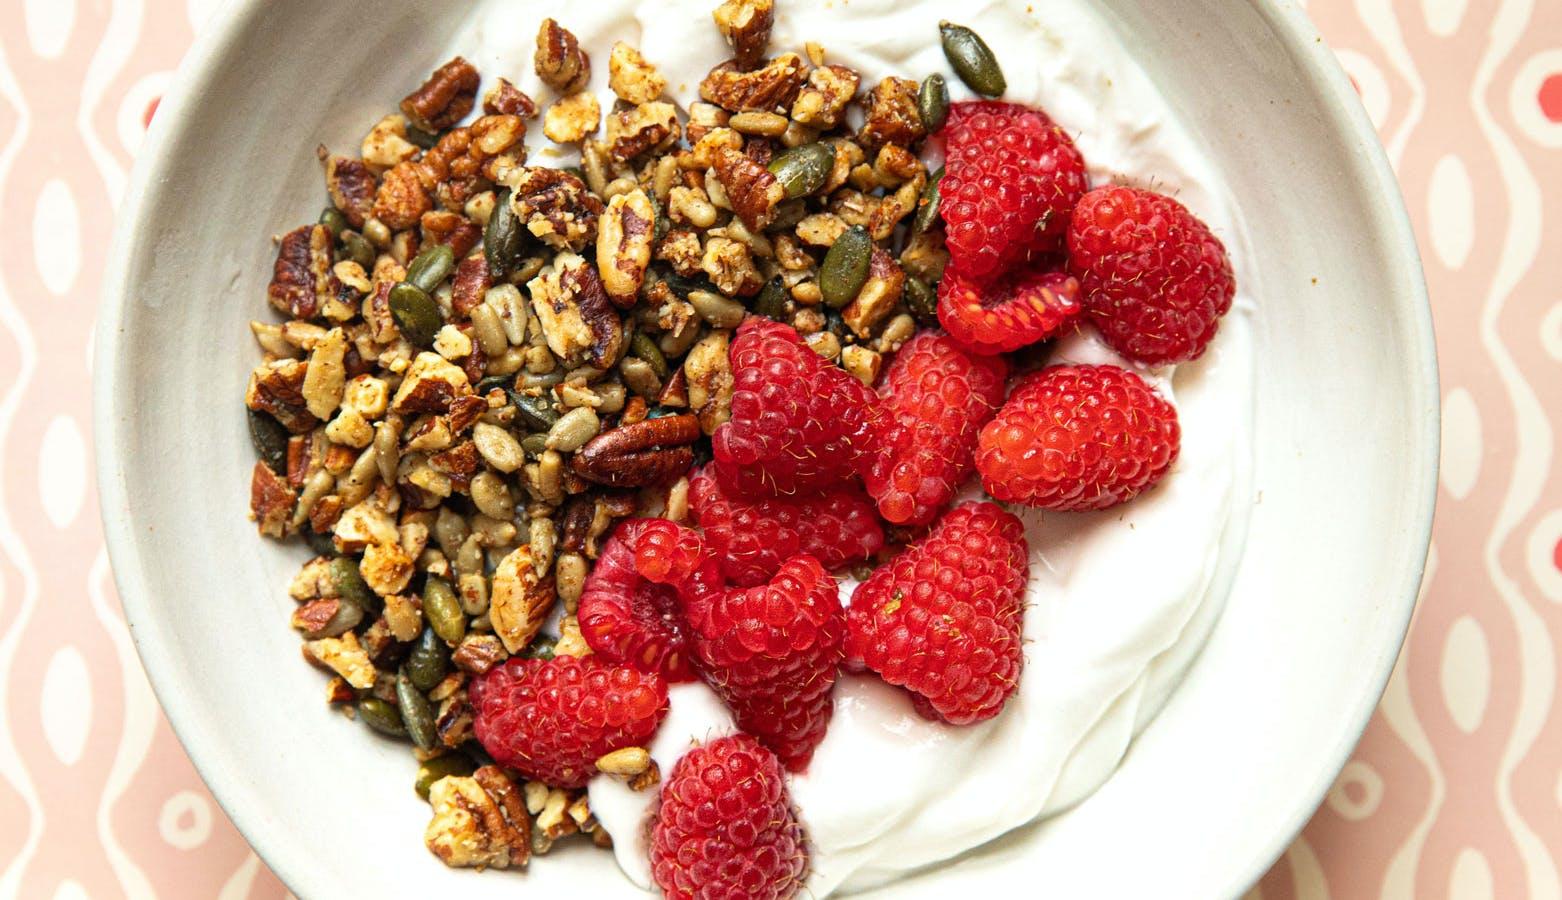 yoghurt and raspberries